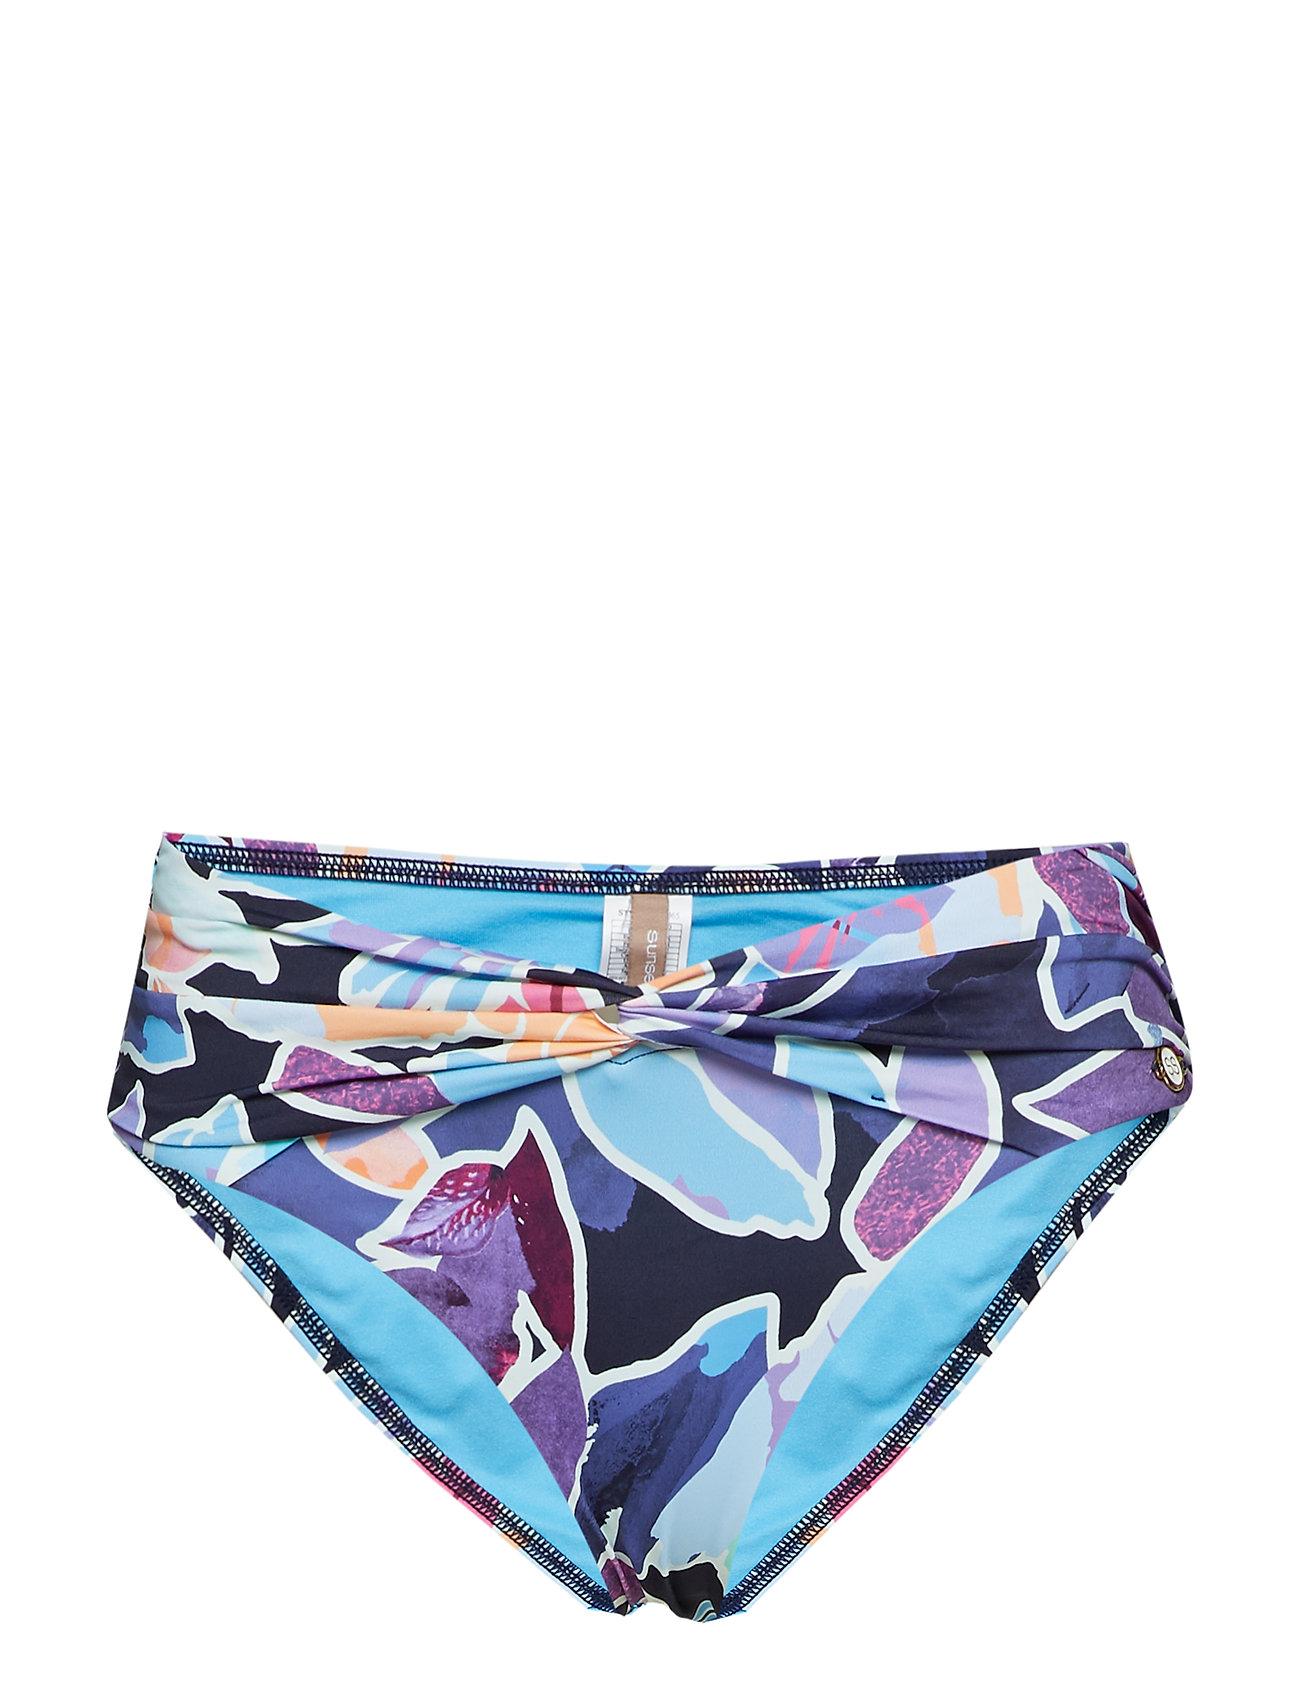 Sunseeker New Tahitian Full Classic Pant - NAVY